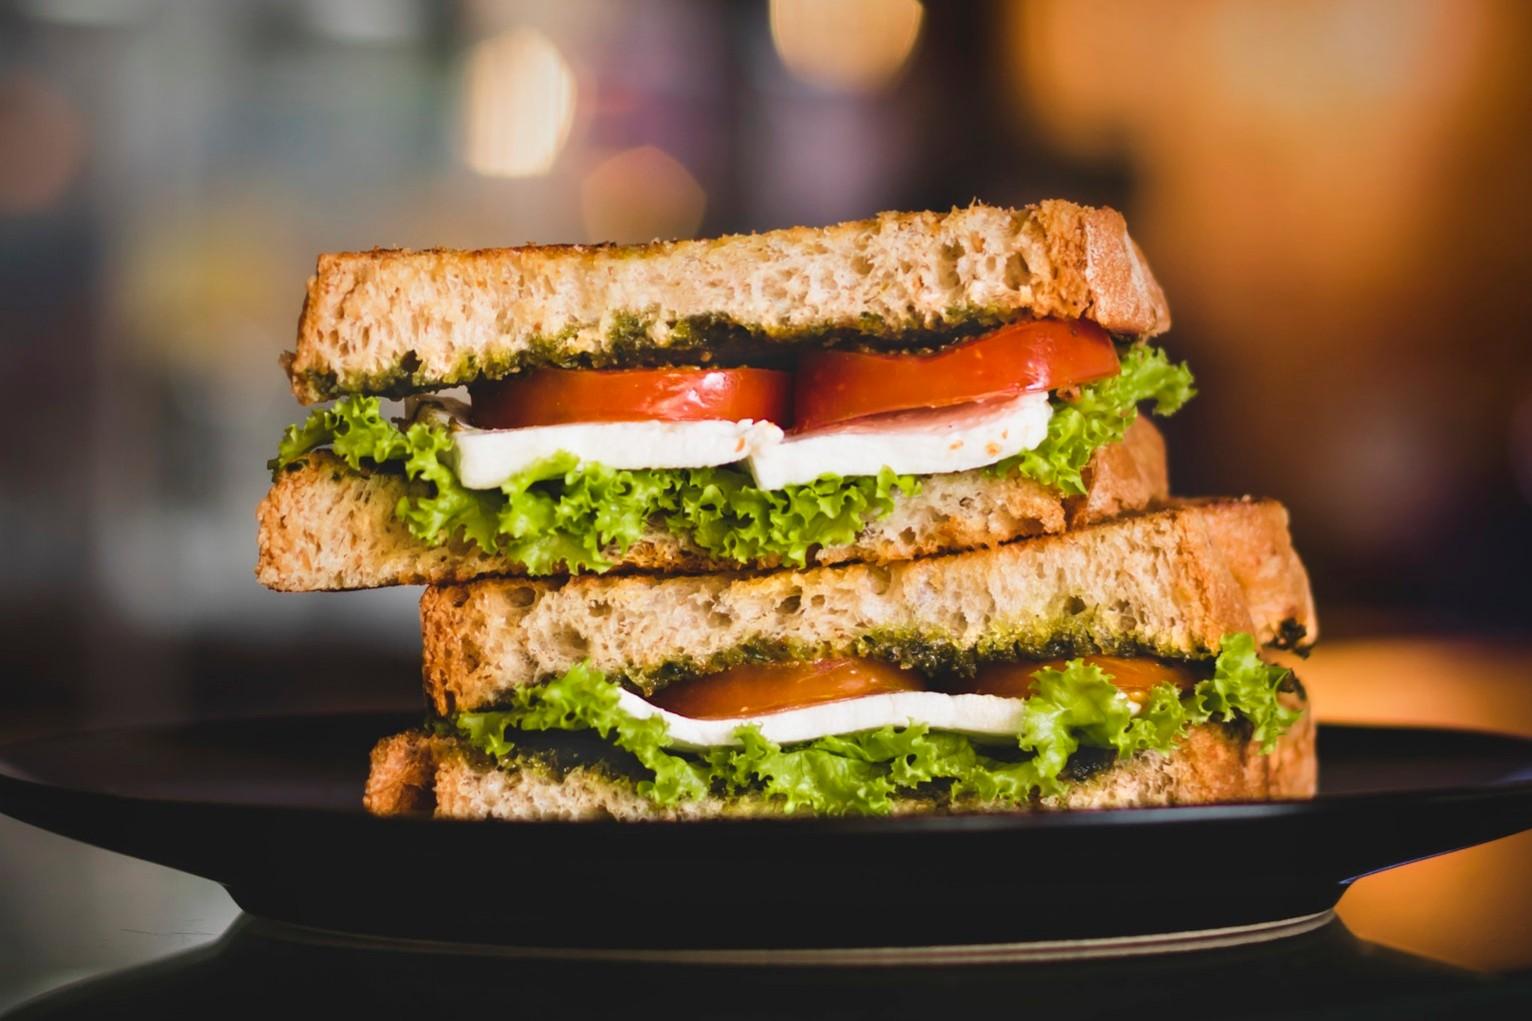 Receita de sanduíche frio com queijo branco